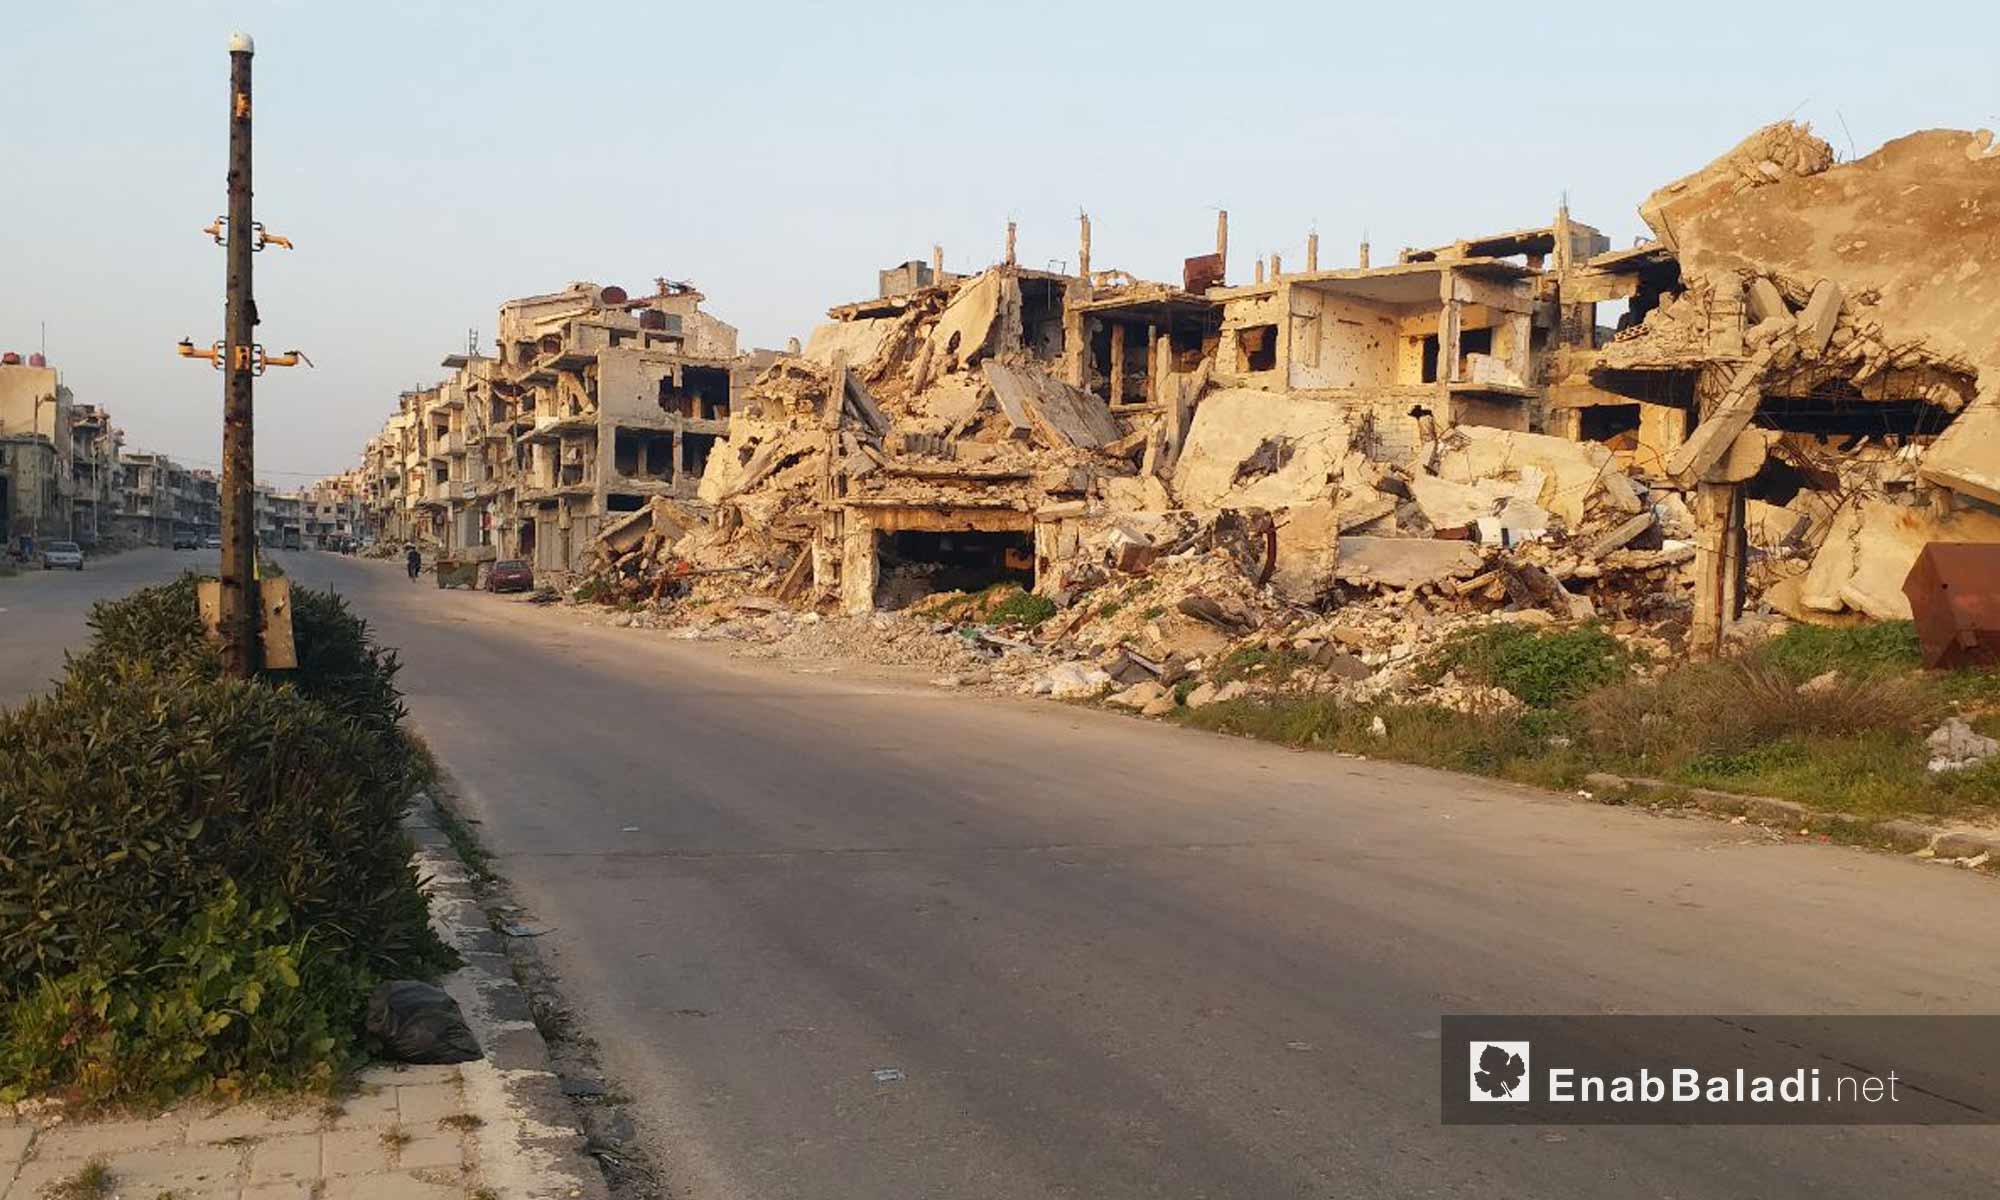 The old neighborhoods in the city of Homs - January 24, 2019 (Enab Baladi)